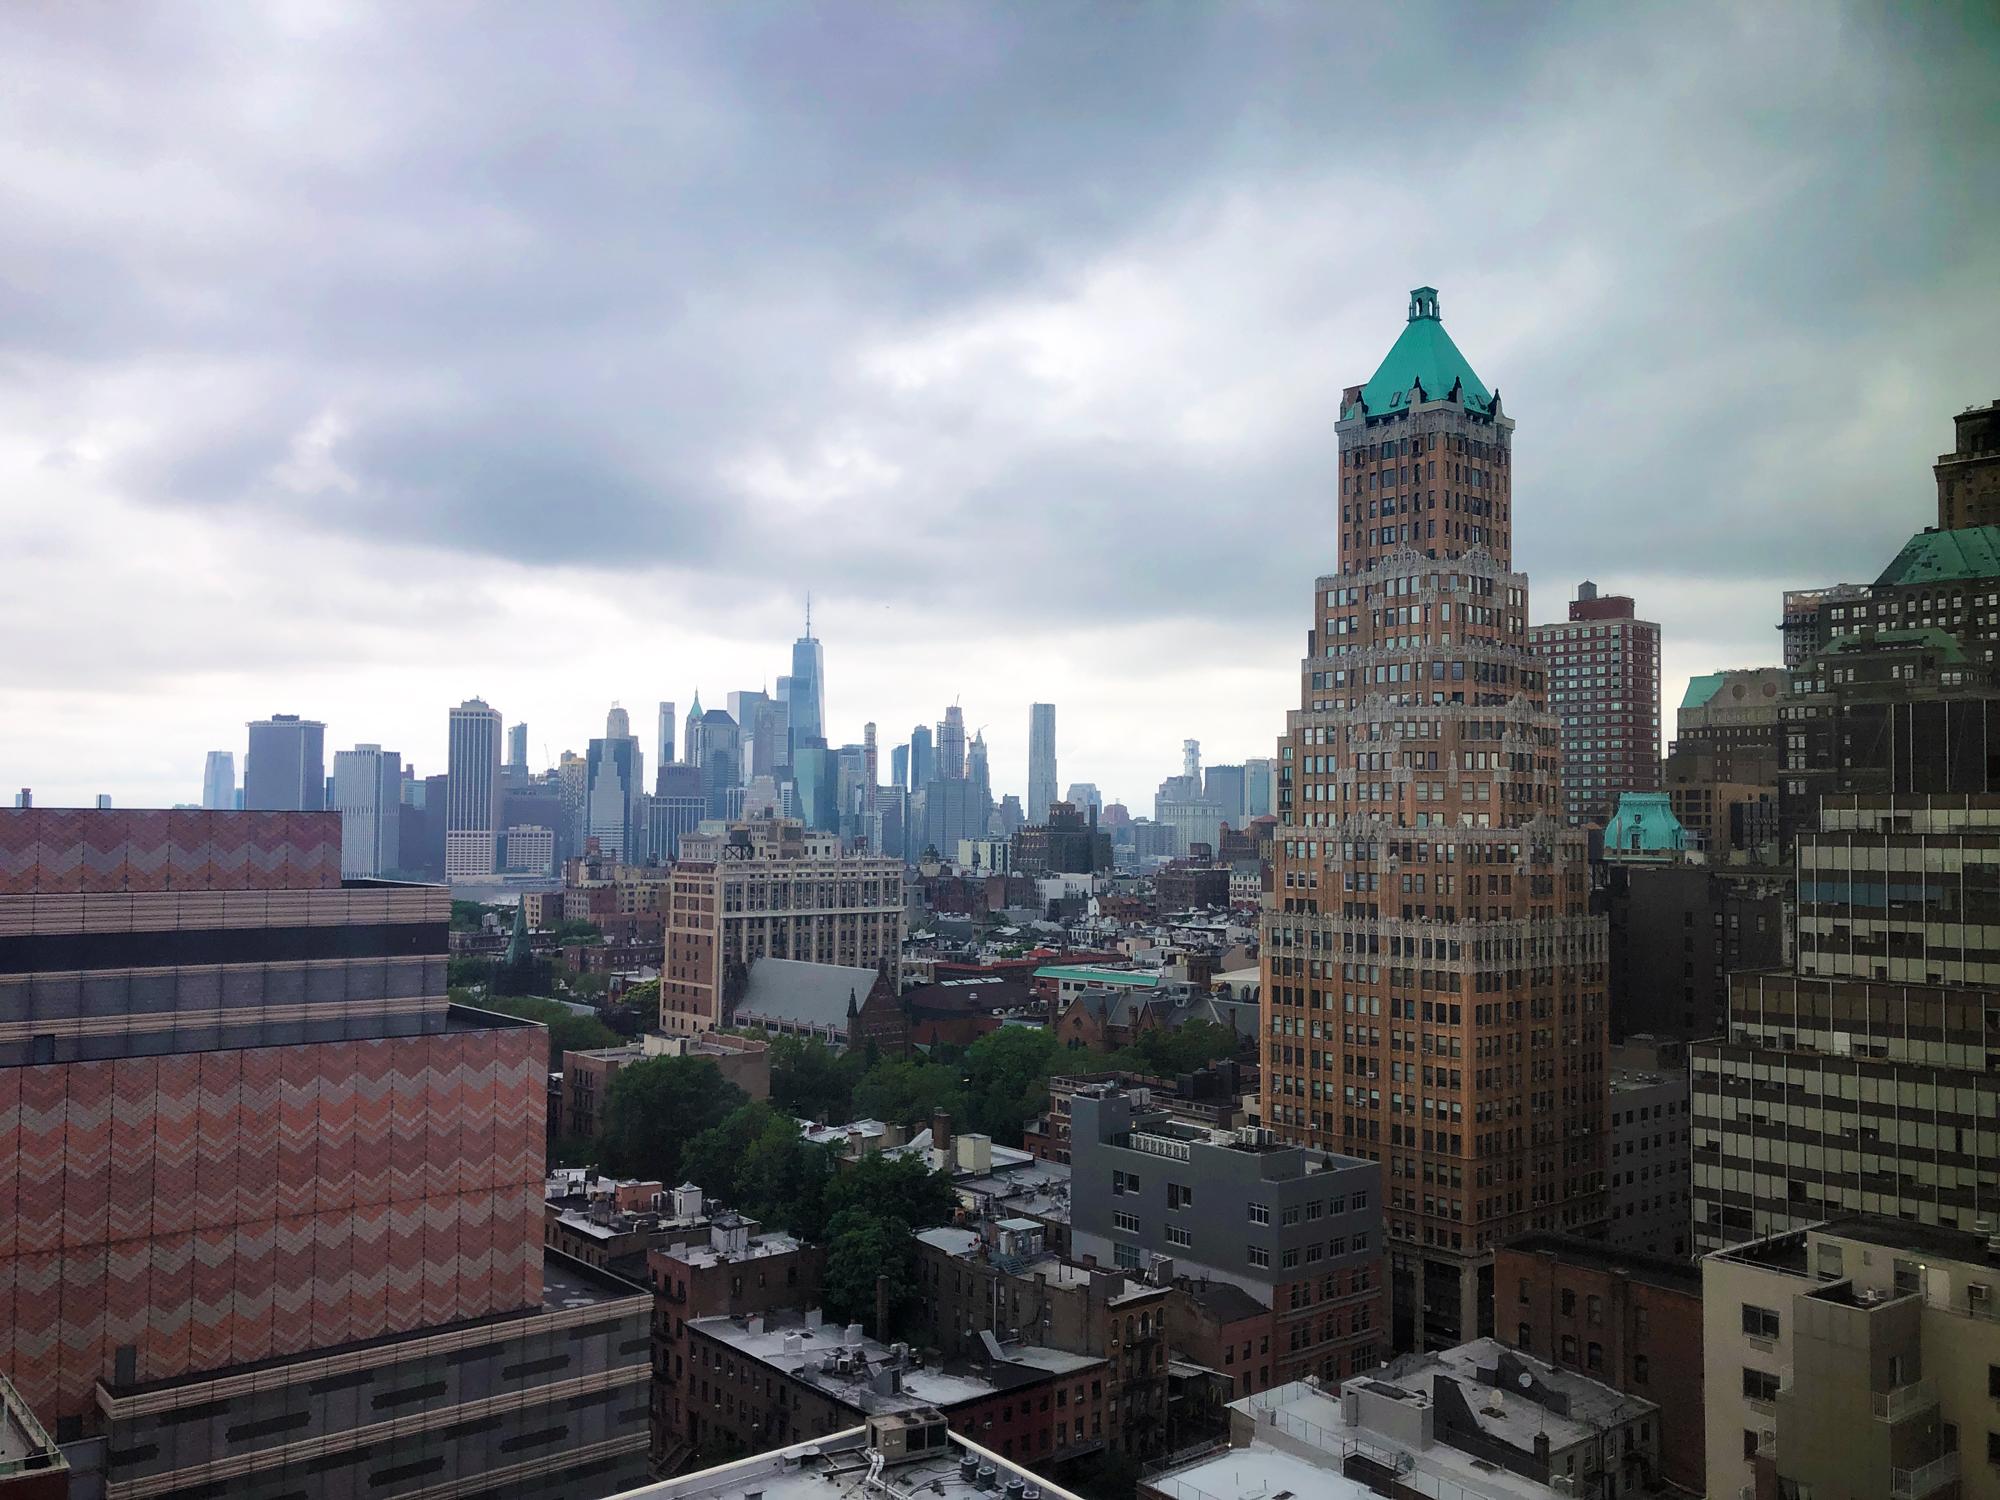 Brooklyn Heights, Monday, June 17, 2019.